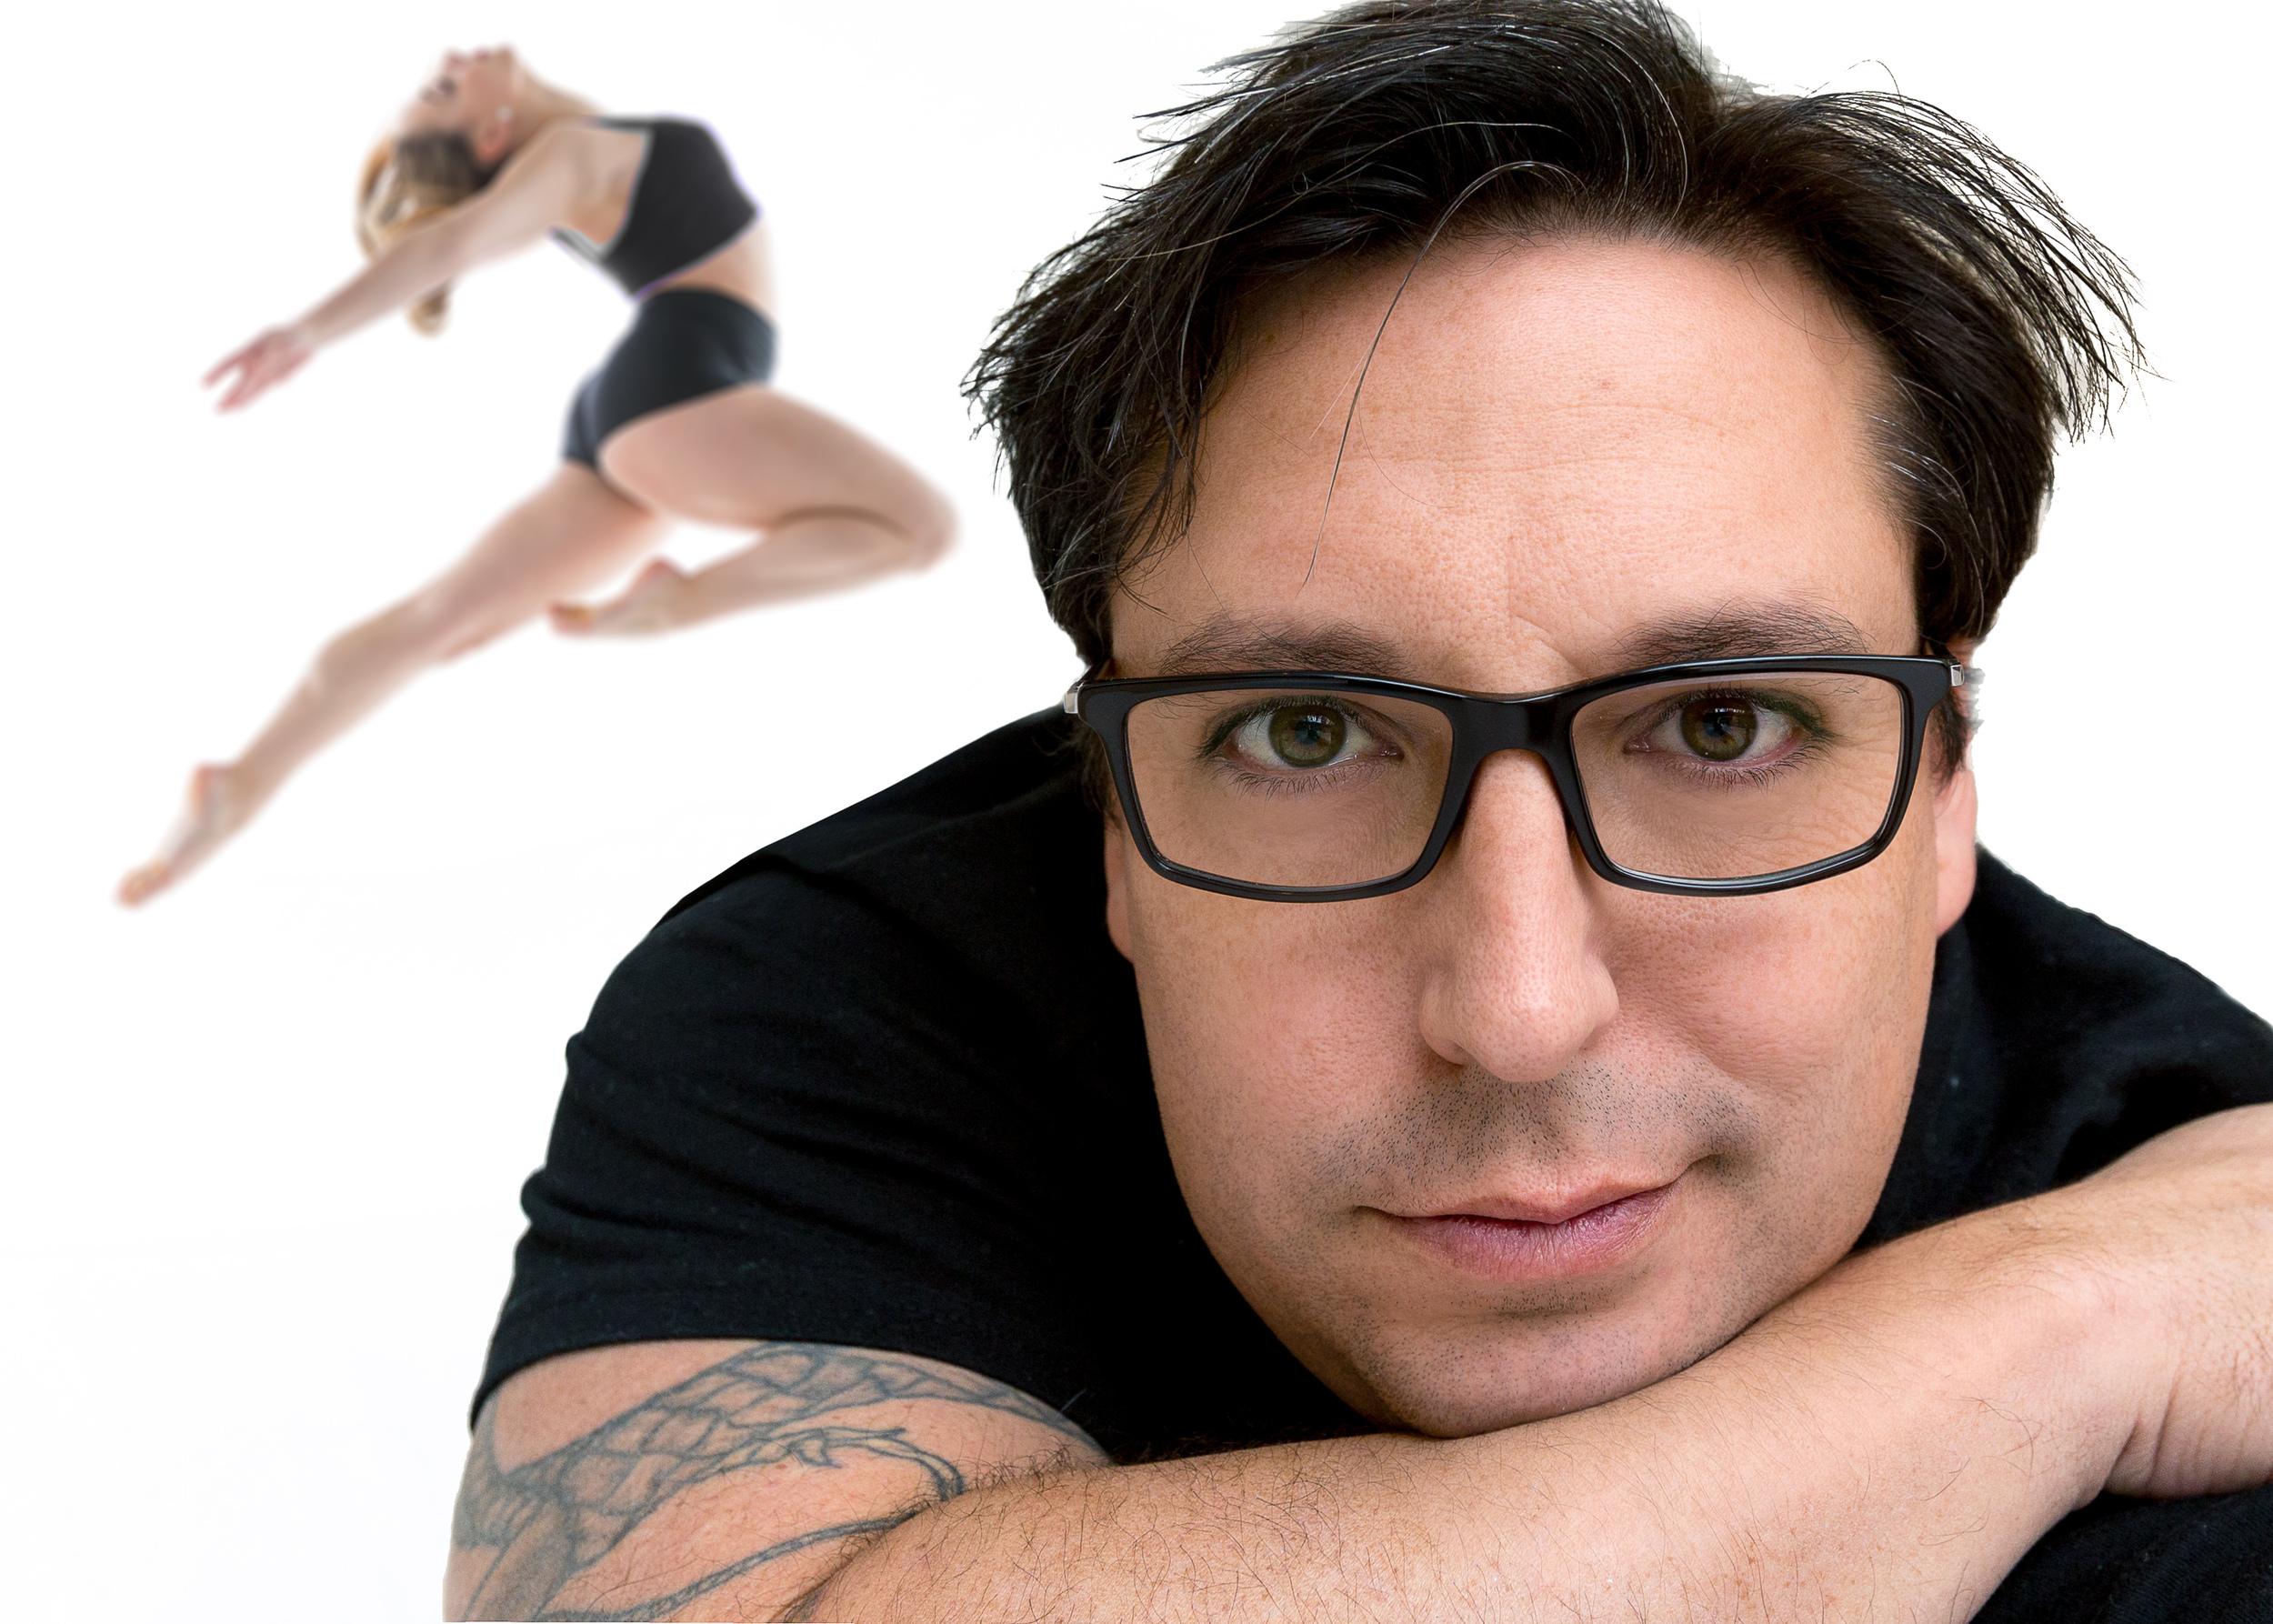 Jonathan Givens - the photographer. Alyssa Barton - the dancer.